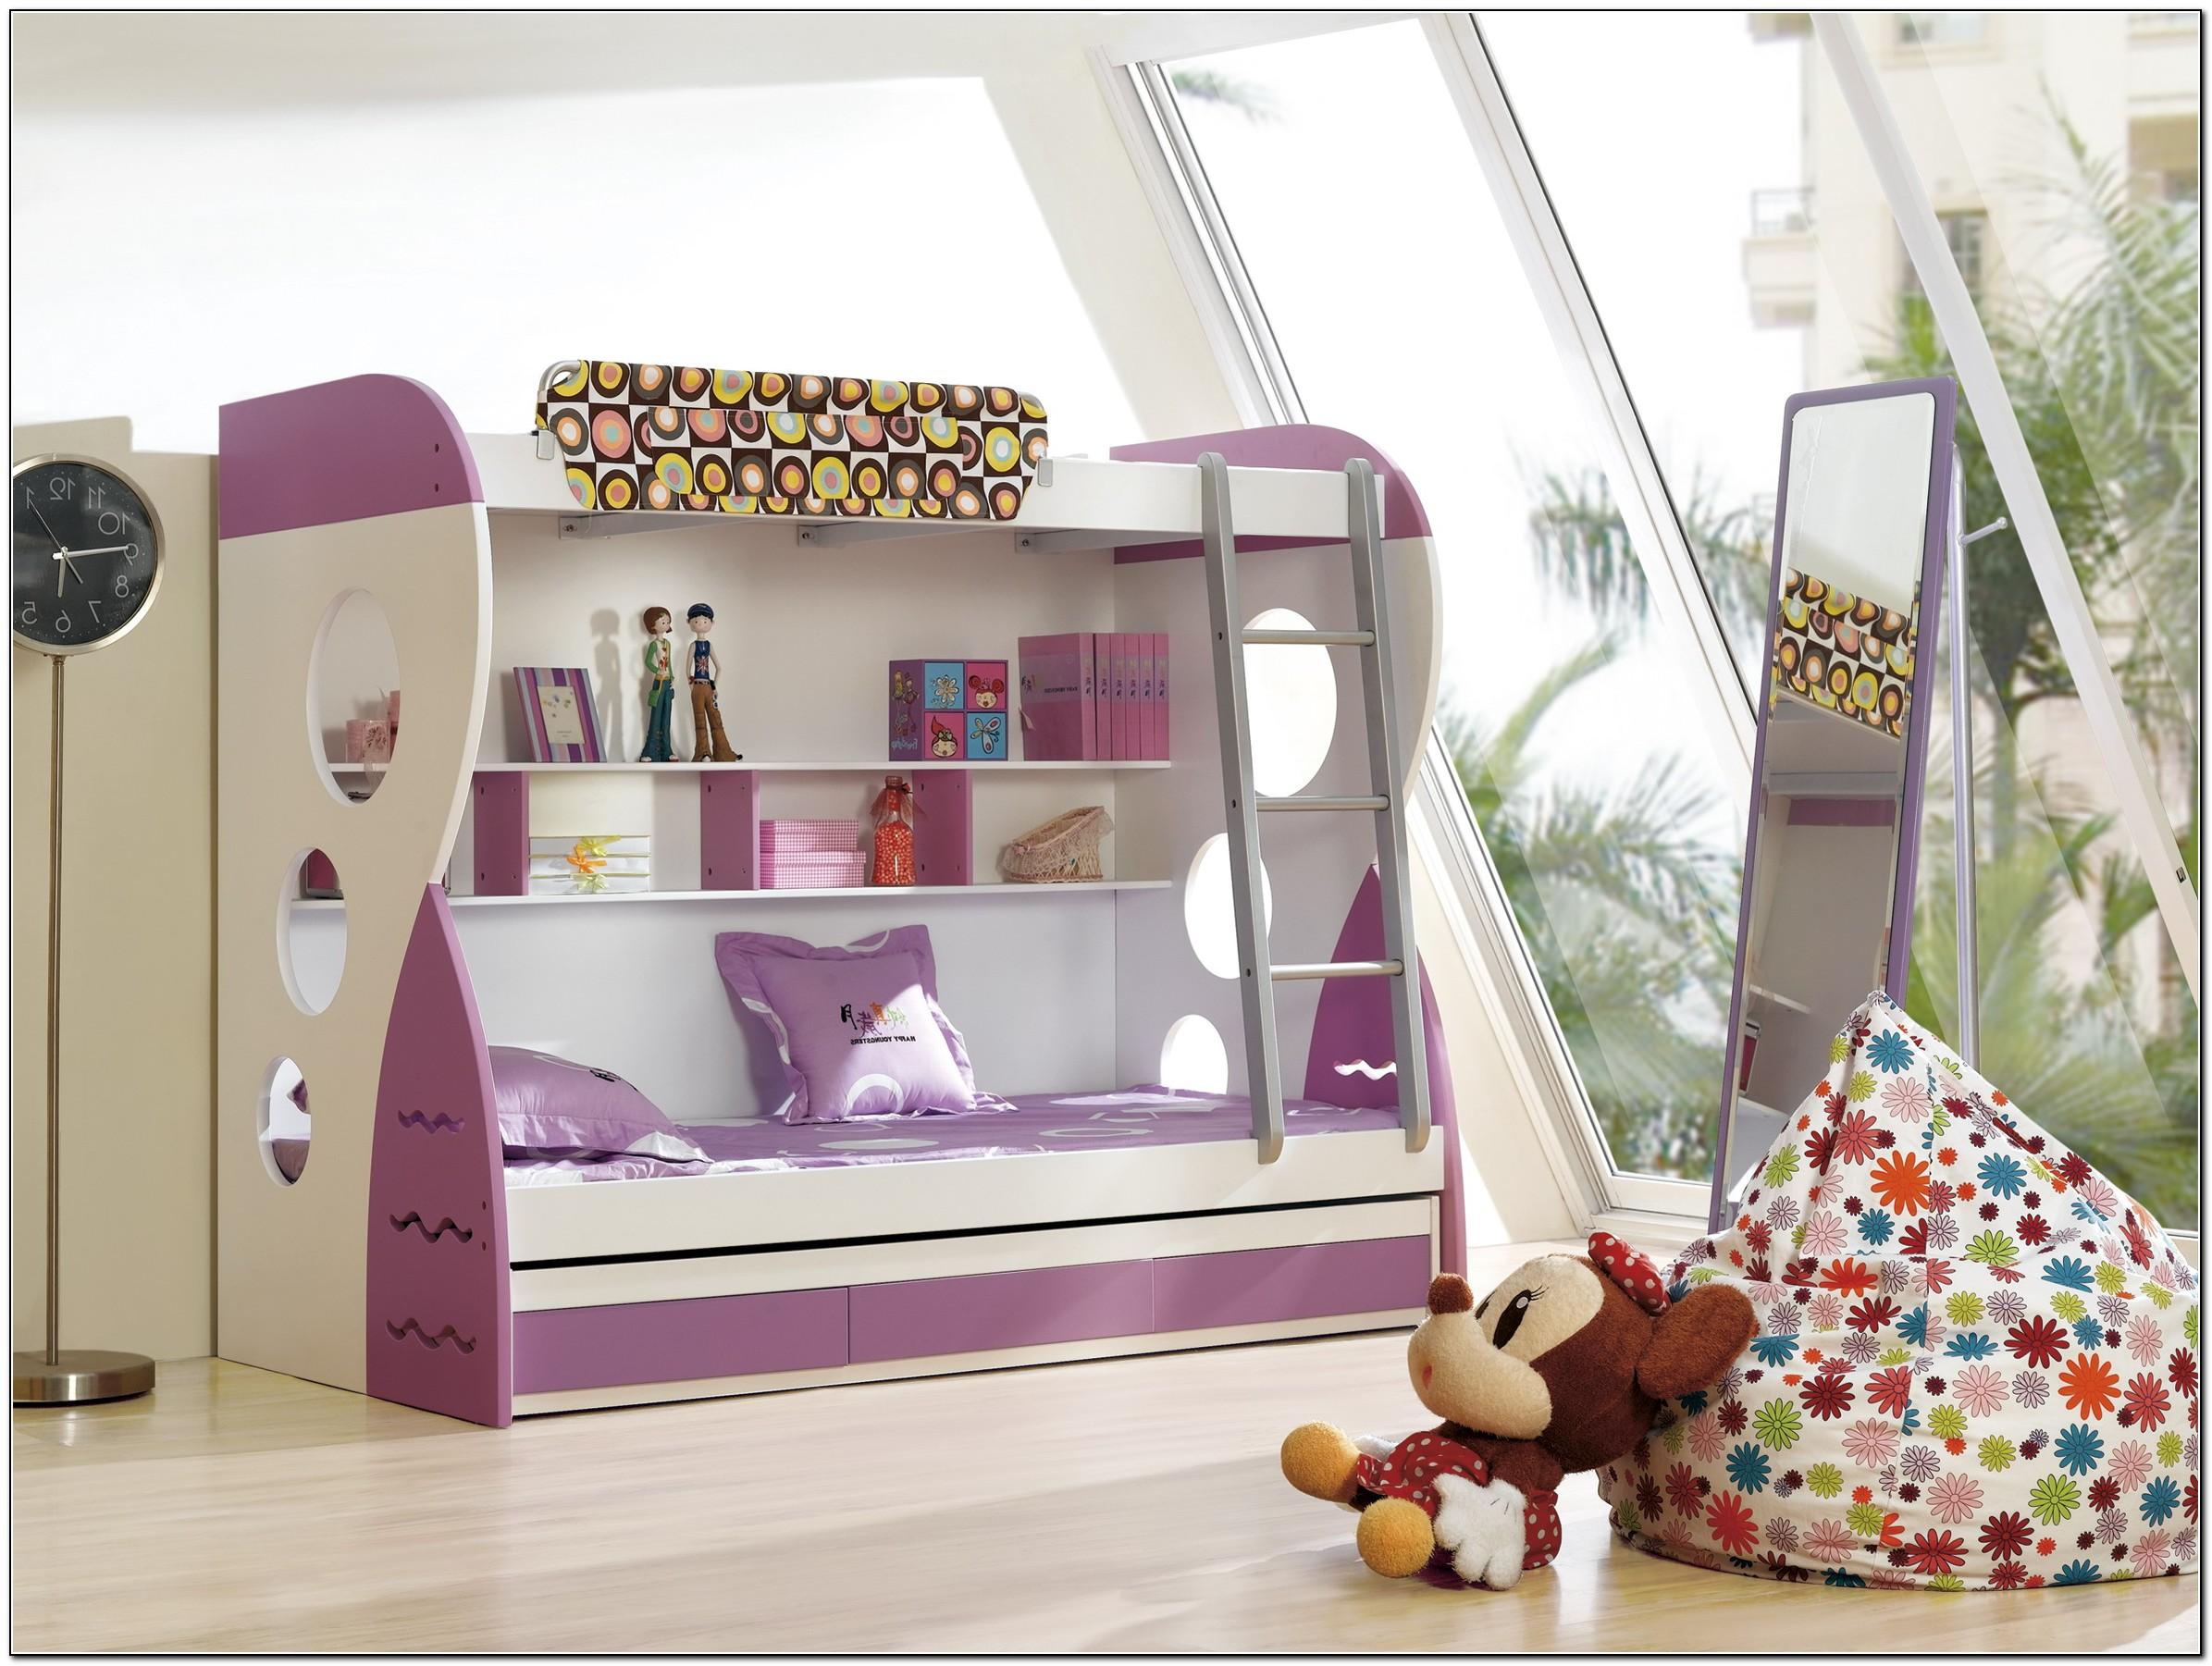 Teenage Girl Bunk Beds - Beds : Home Design Ideas #R6DVeB6nmz9442